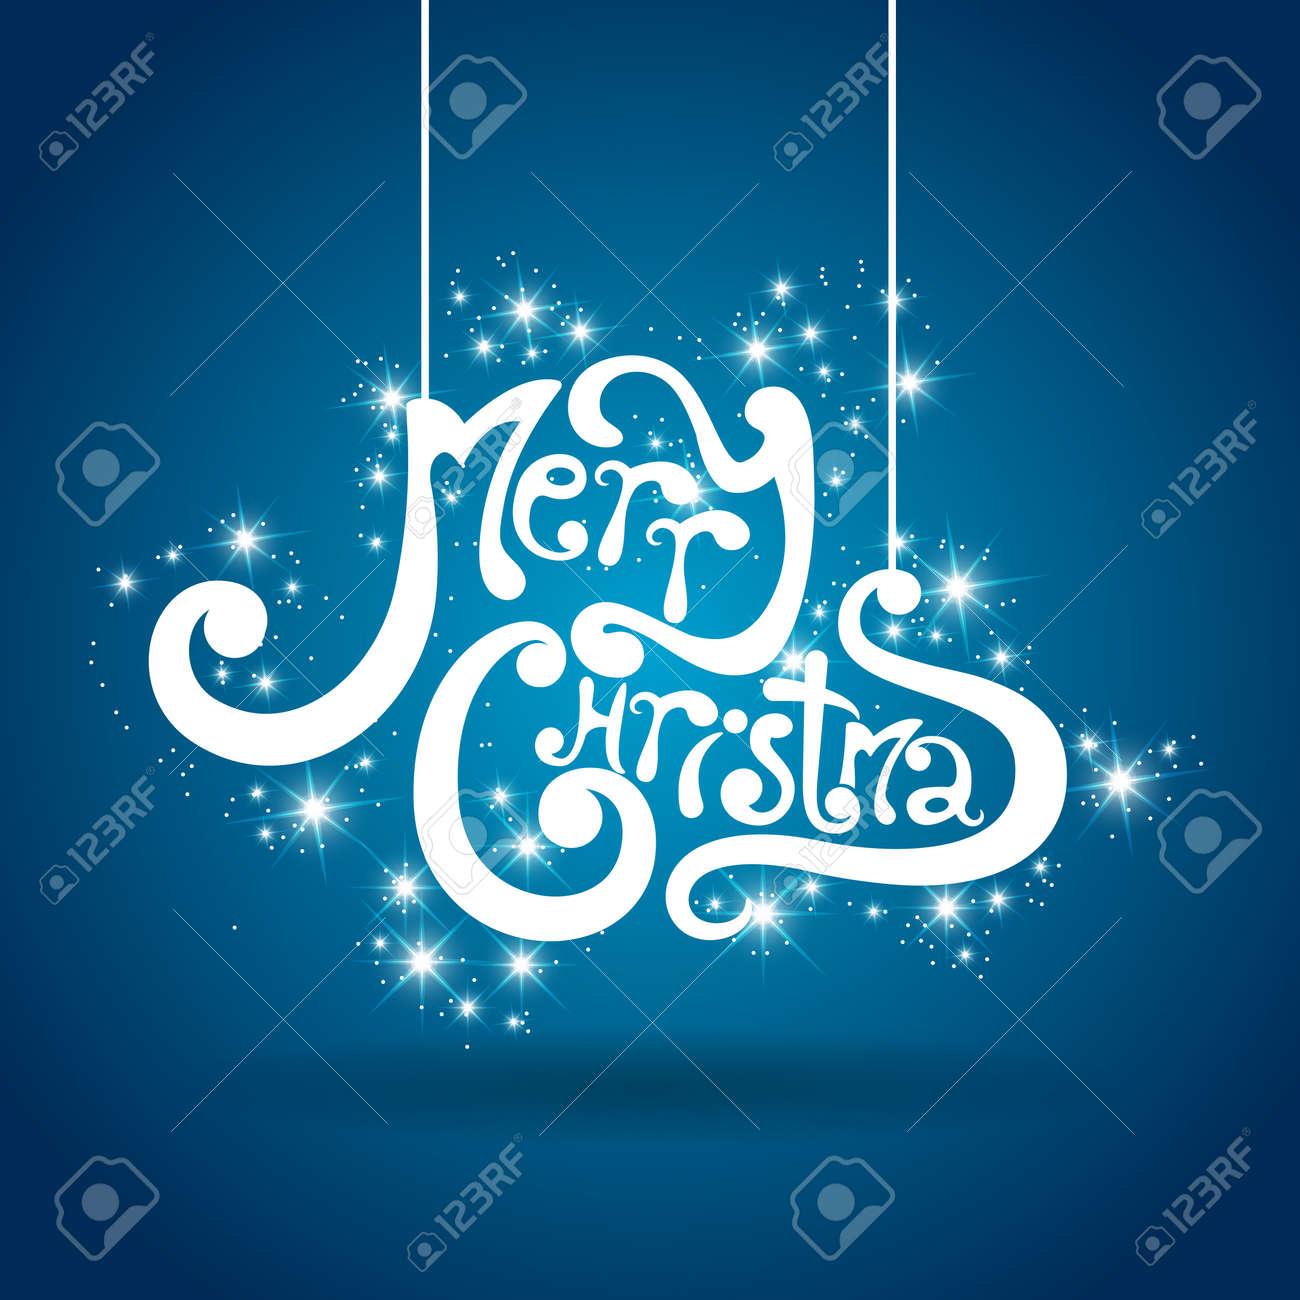 merry Christmas greeting card Stock Vector - 16610541